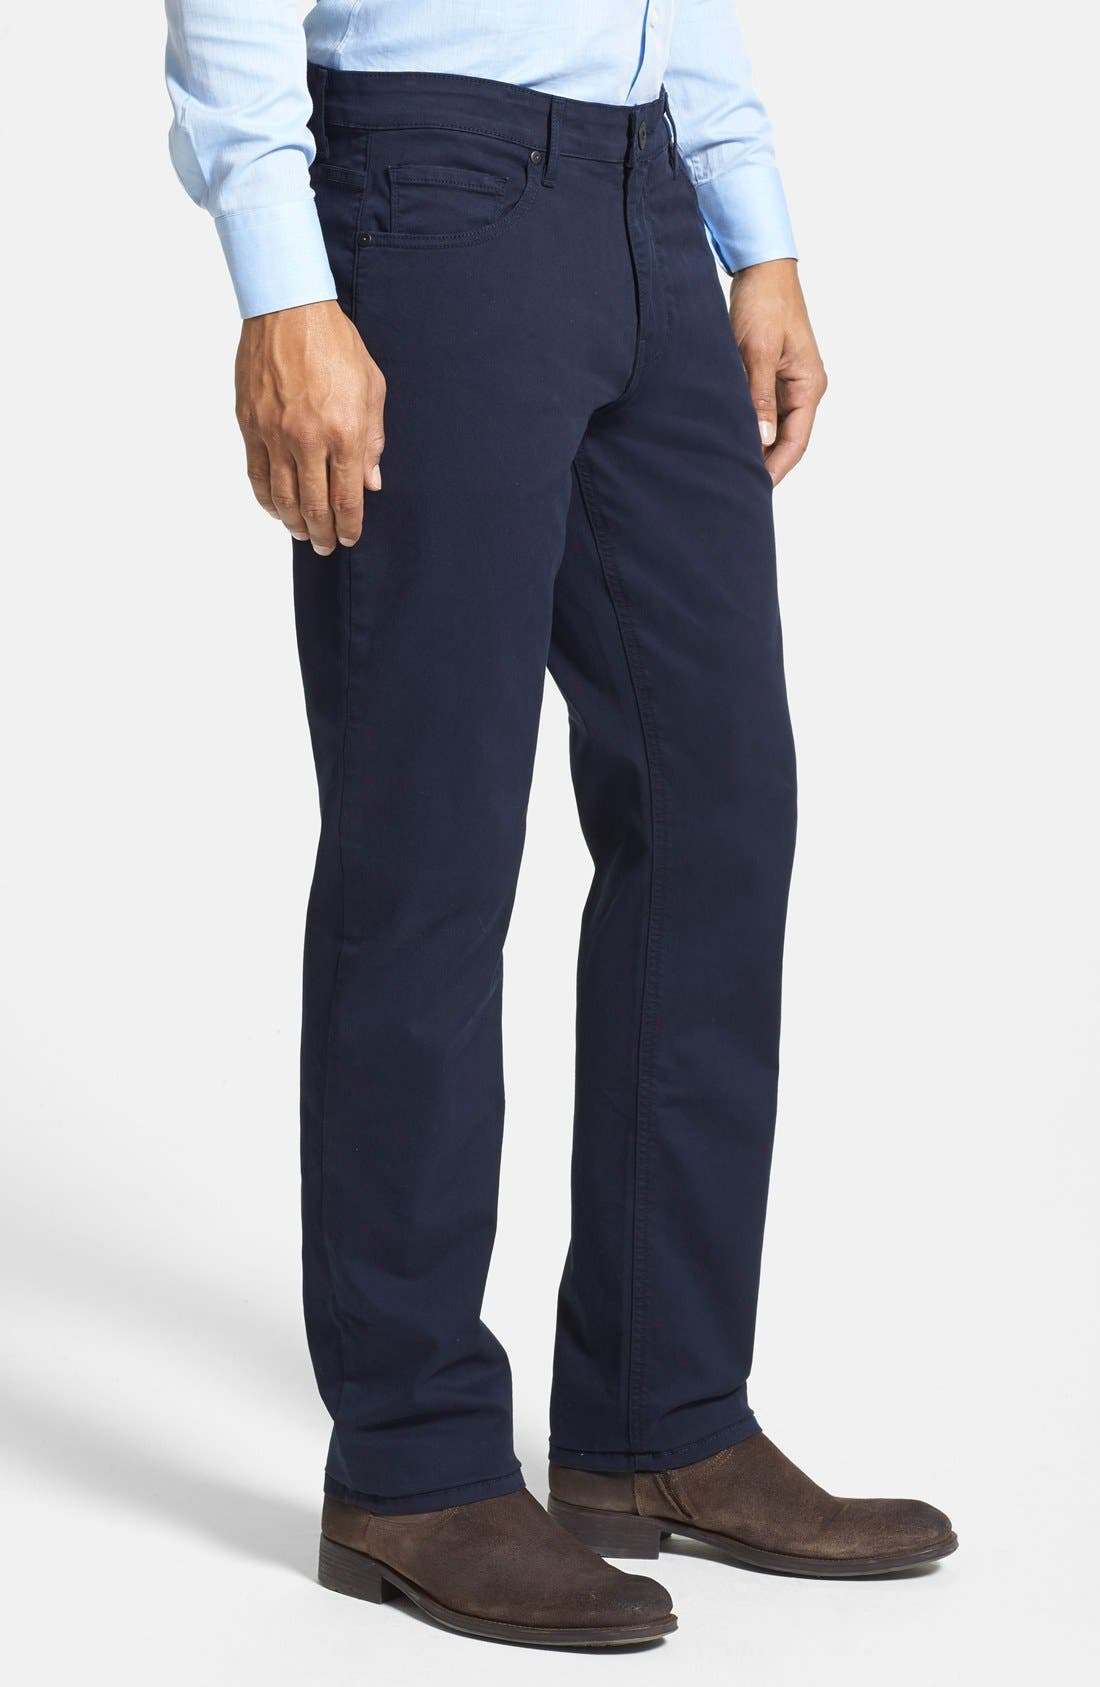 PAIGE, Normandie Slim Straight Leg Twill Pants, Alternate thumbnail 4, color, NAVY CADET